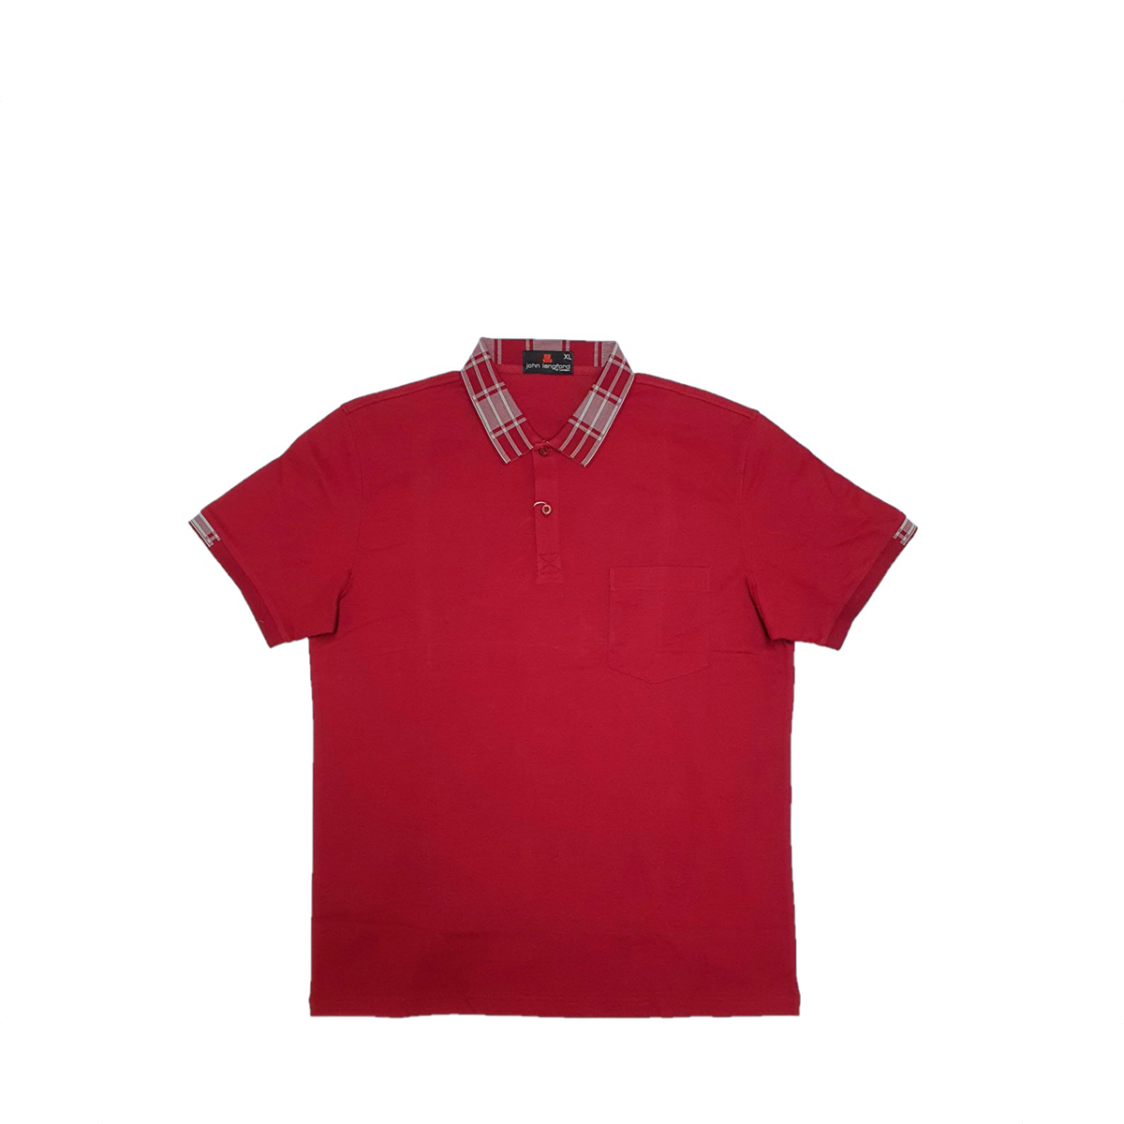 John Langford Honeycombed Polo T-Shirt with Pocket and Digital Printed Collar Maroon